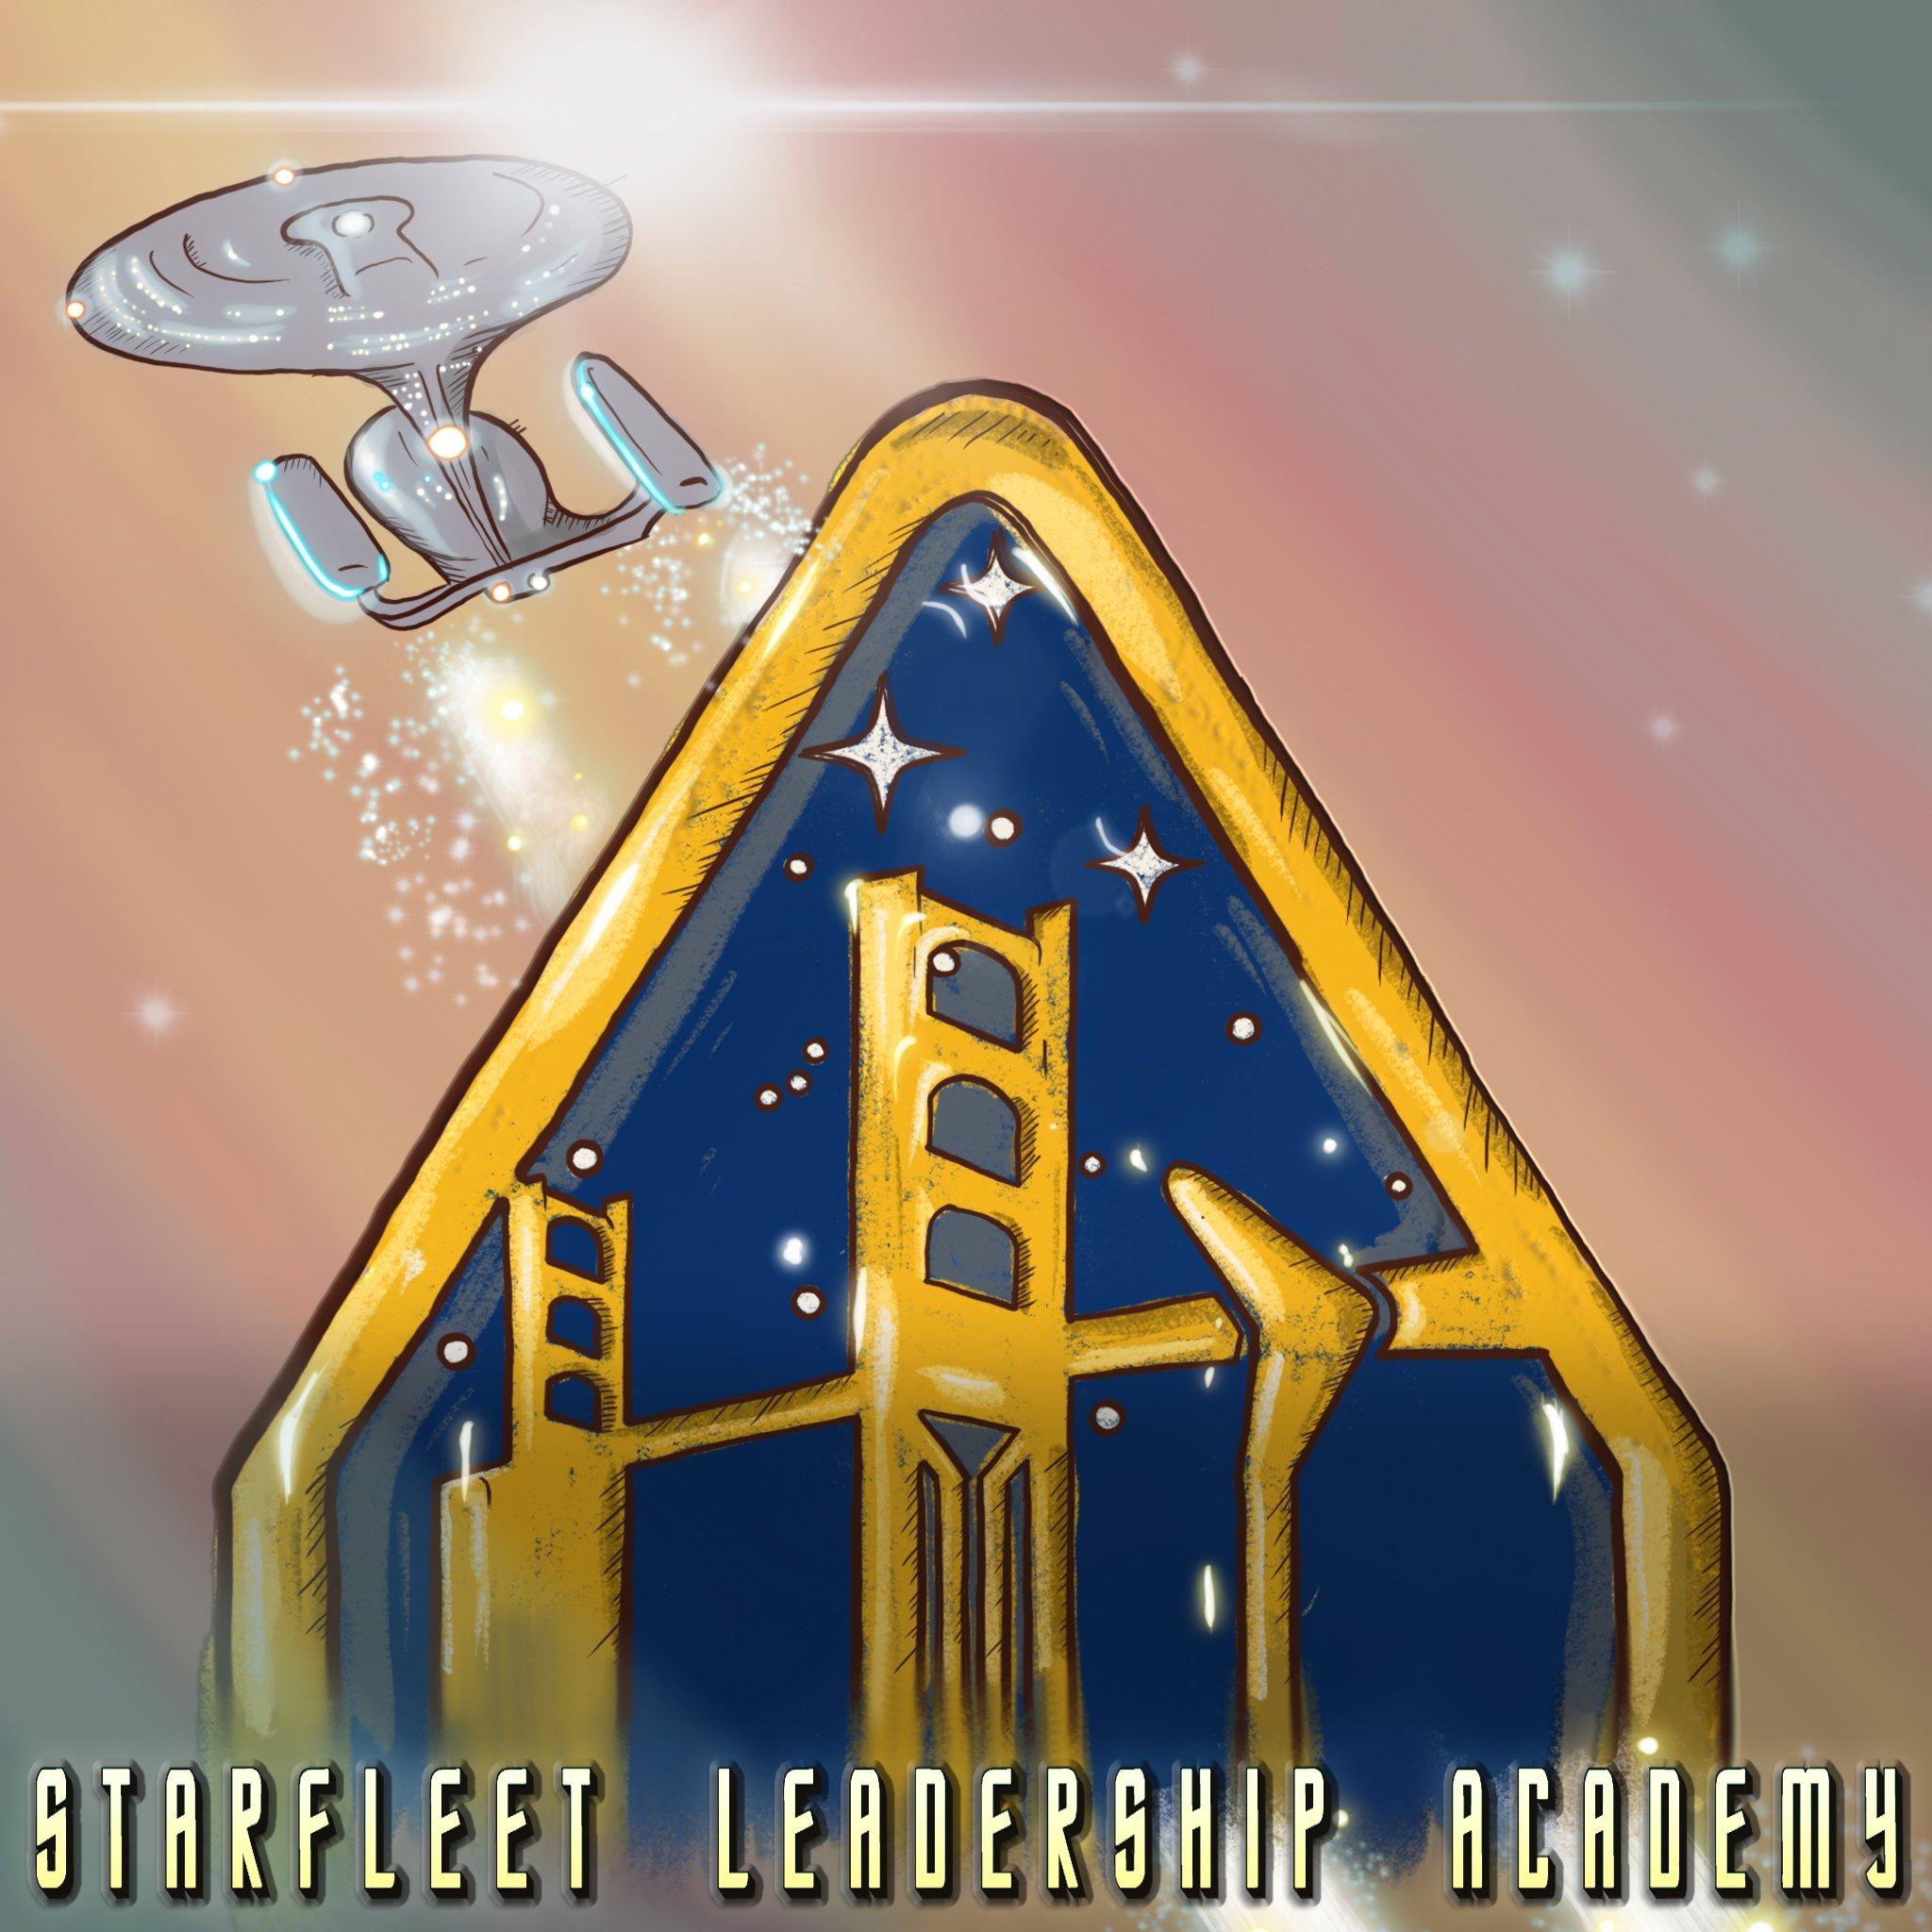 Starfleet Leadership Academy - Leadership Through Star Trek